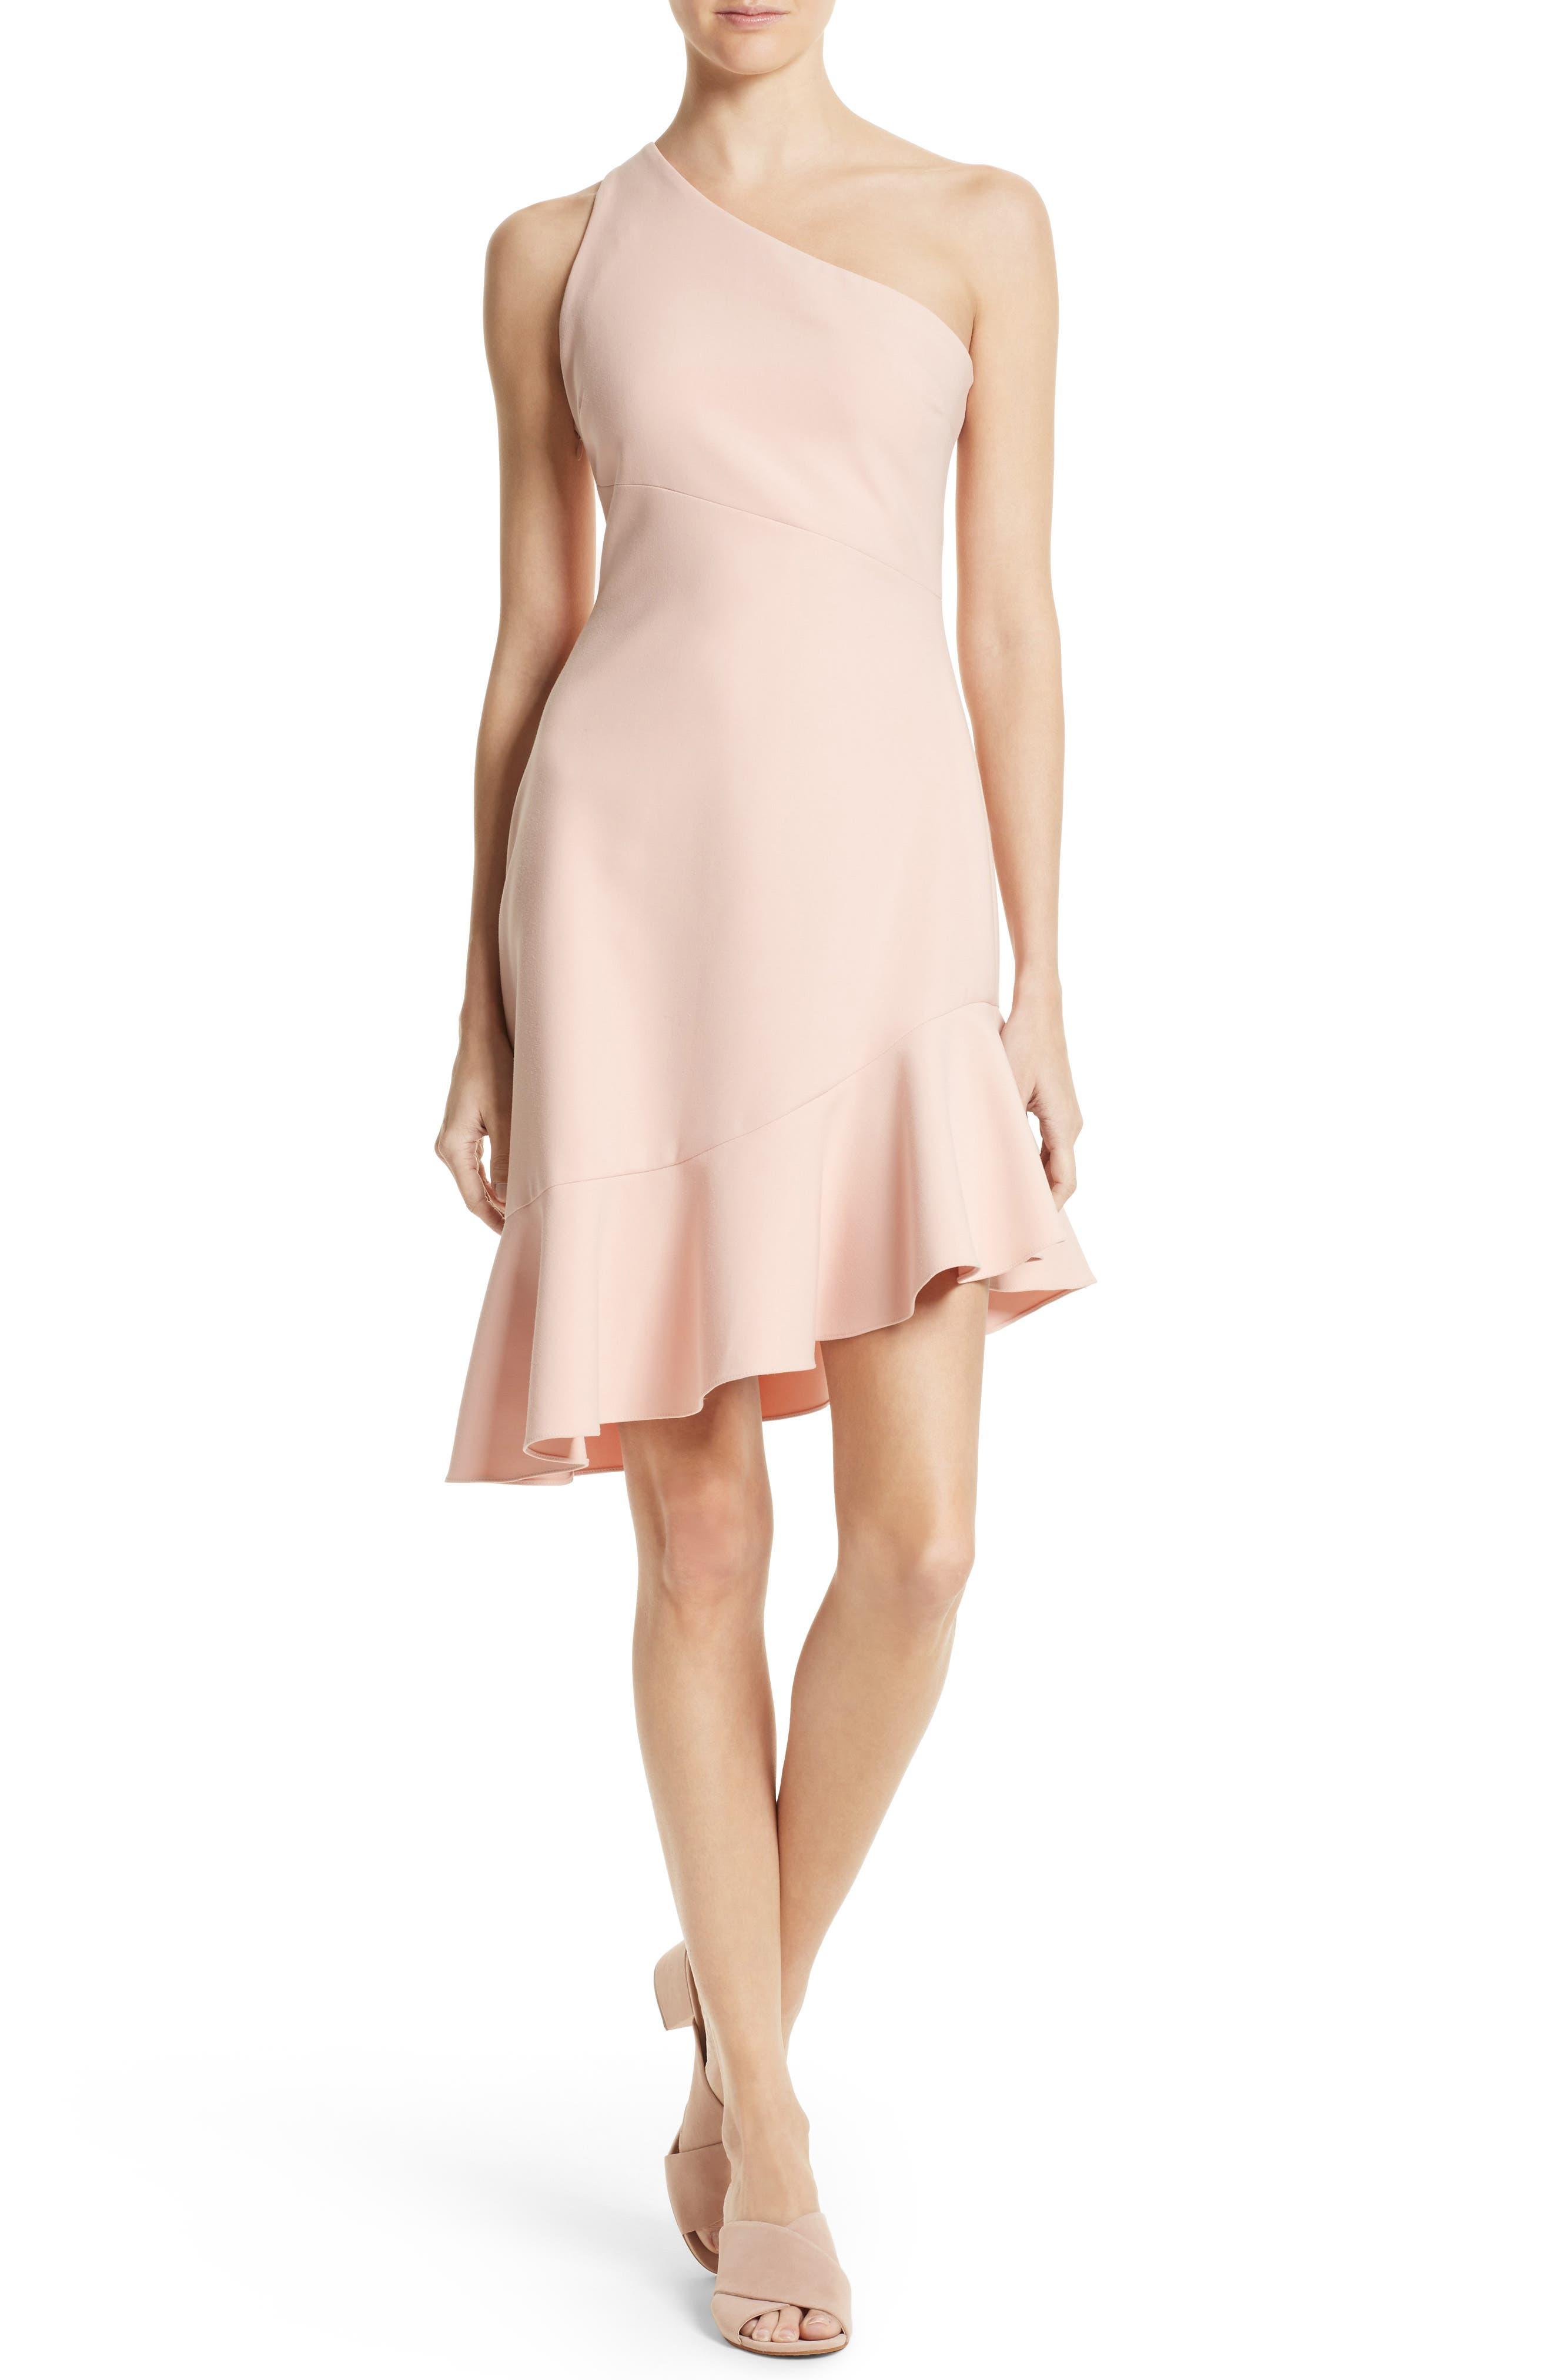 Alternate Image 1 Selected - Cinq à Sept Stella Asymmetrical One-Shoulder Dress